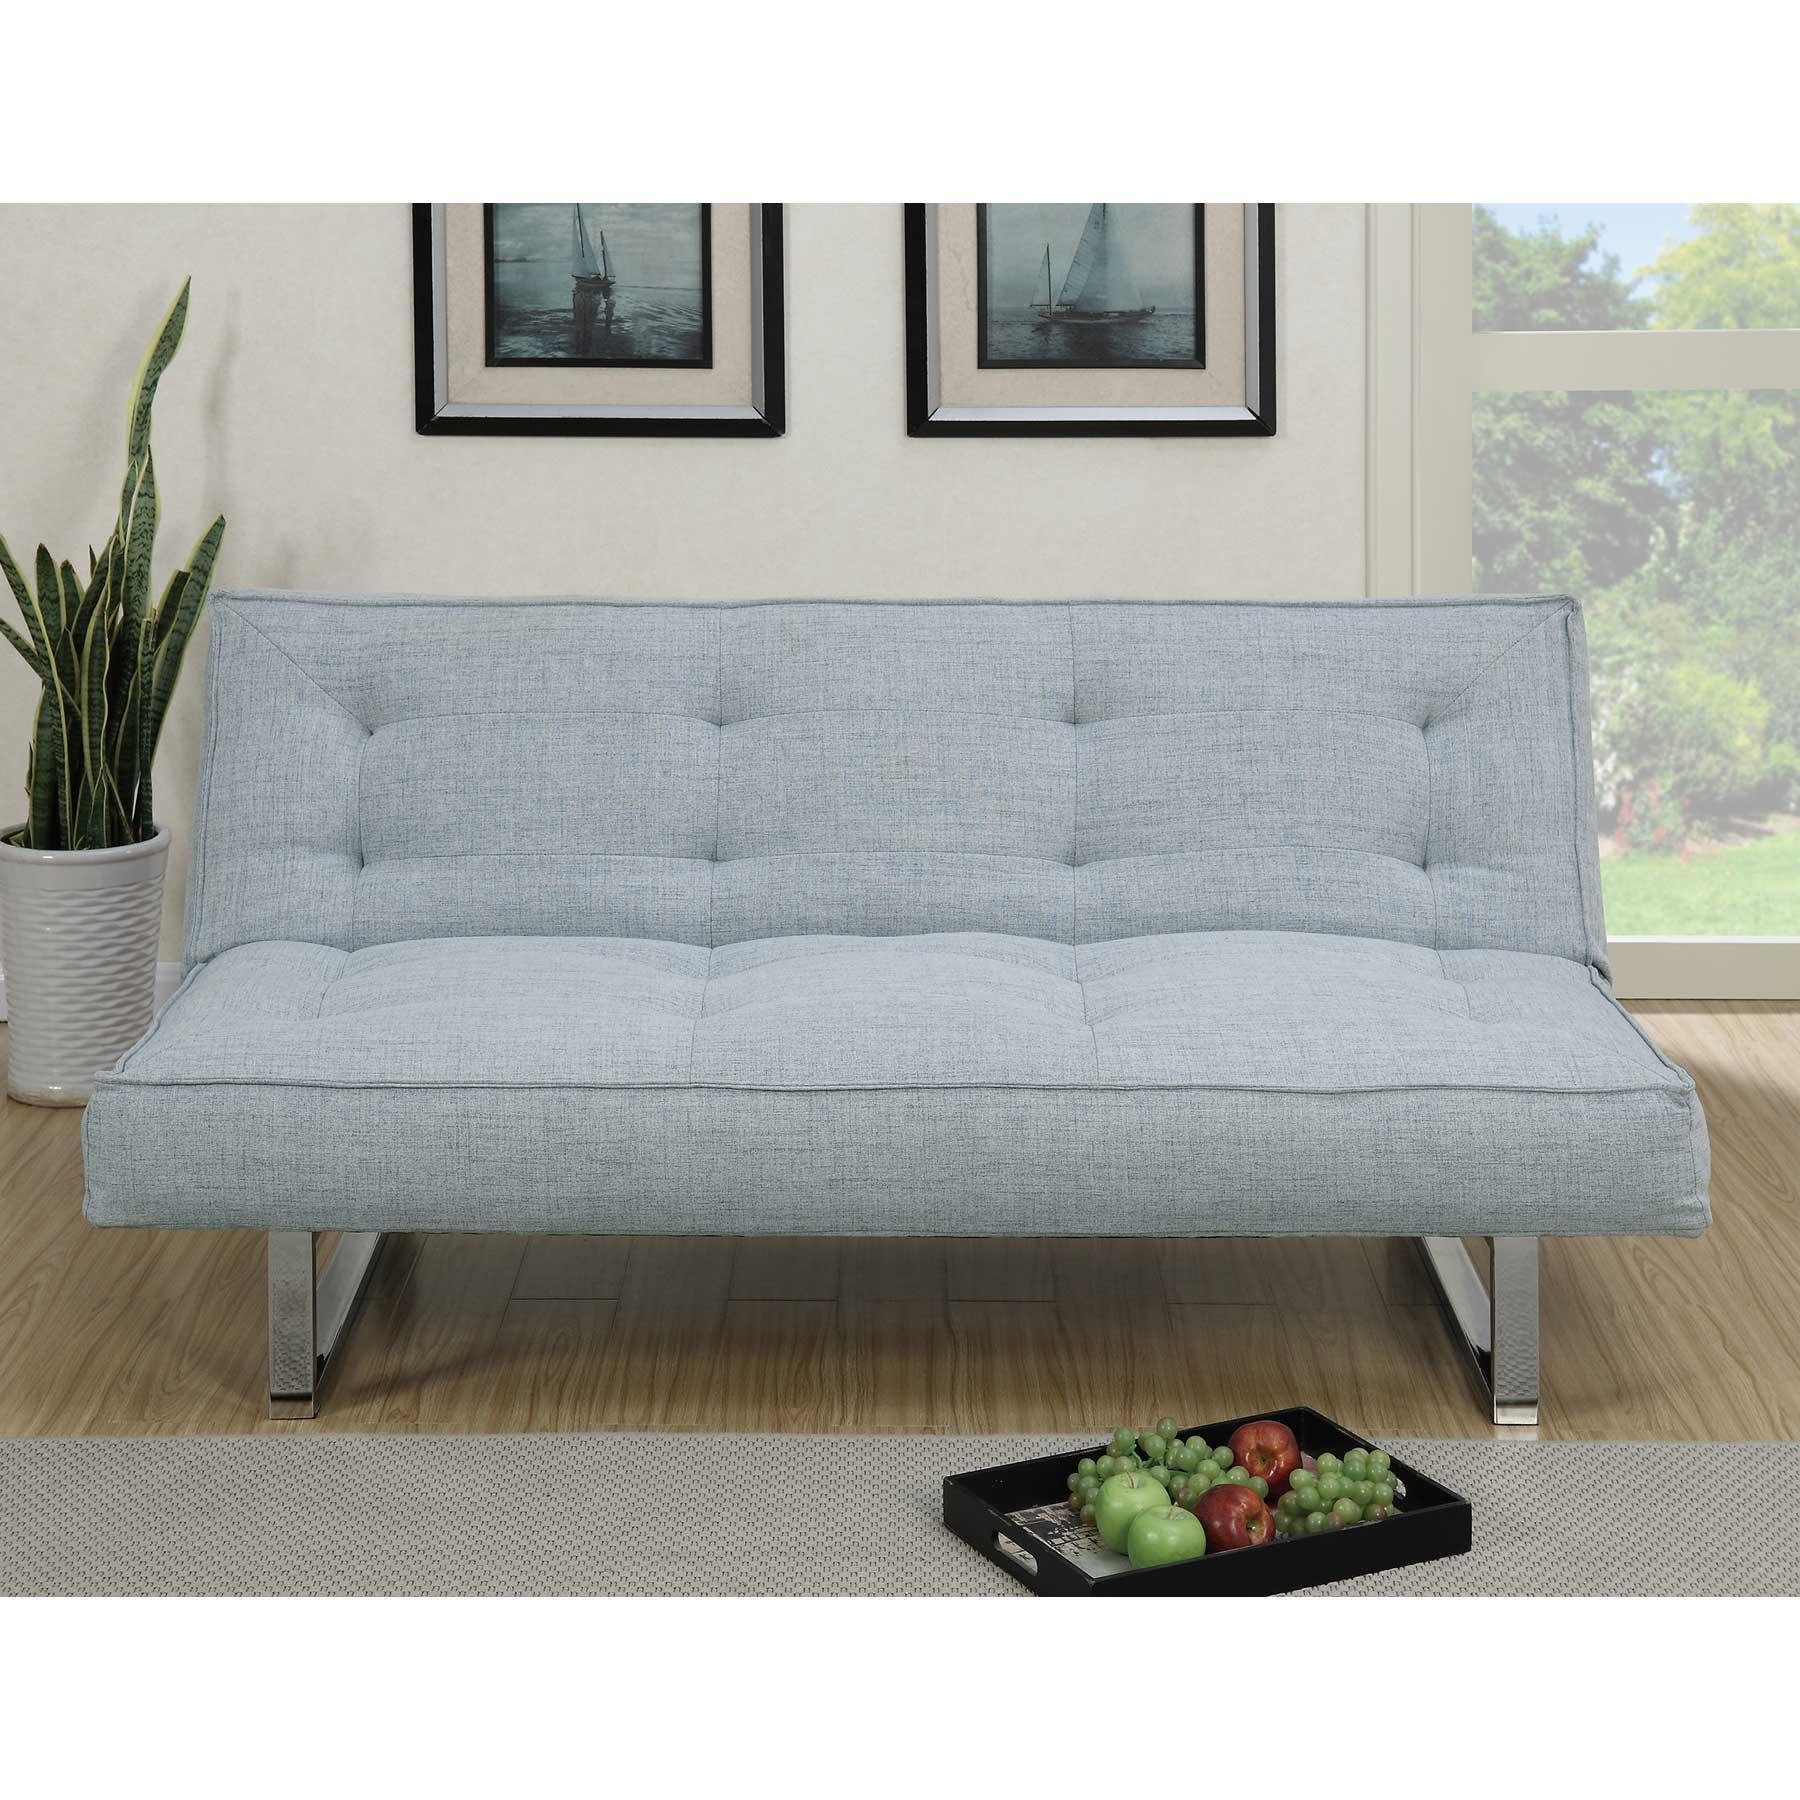 Poundex Light Grey Linon Fabric Adjustable Sofa Bed Futon